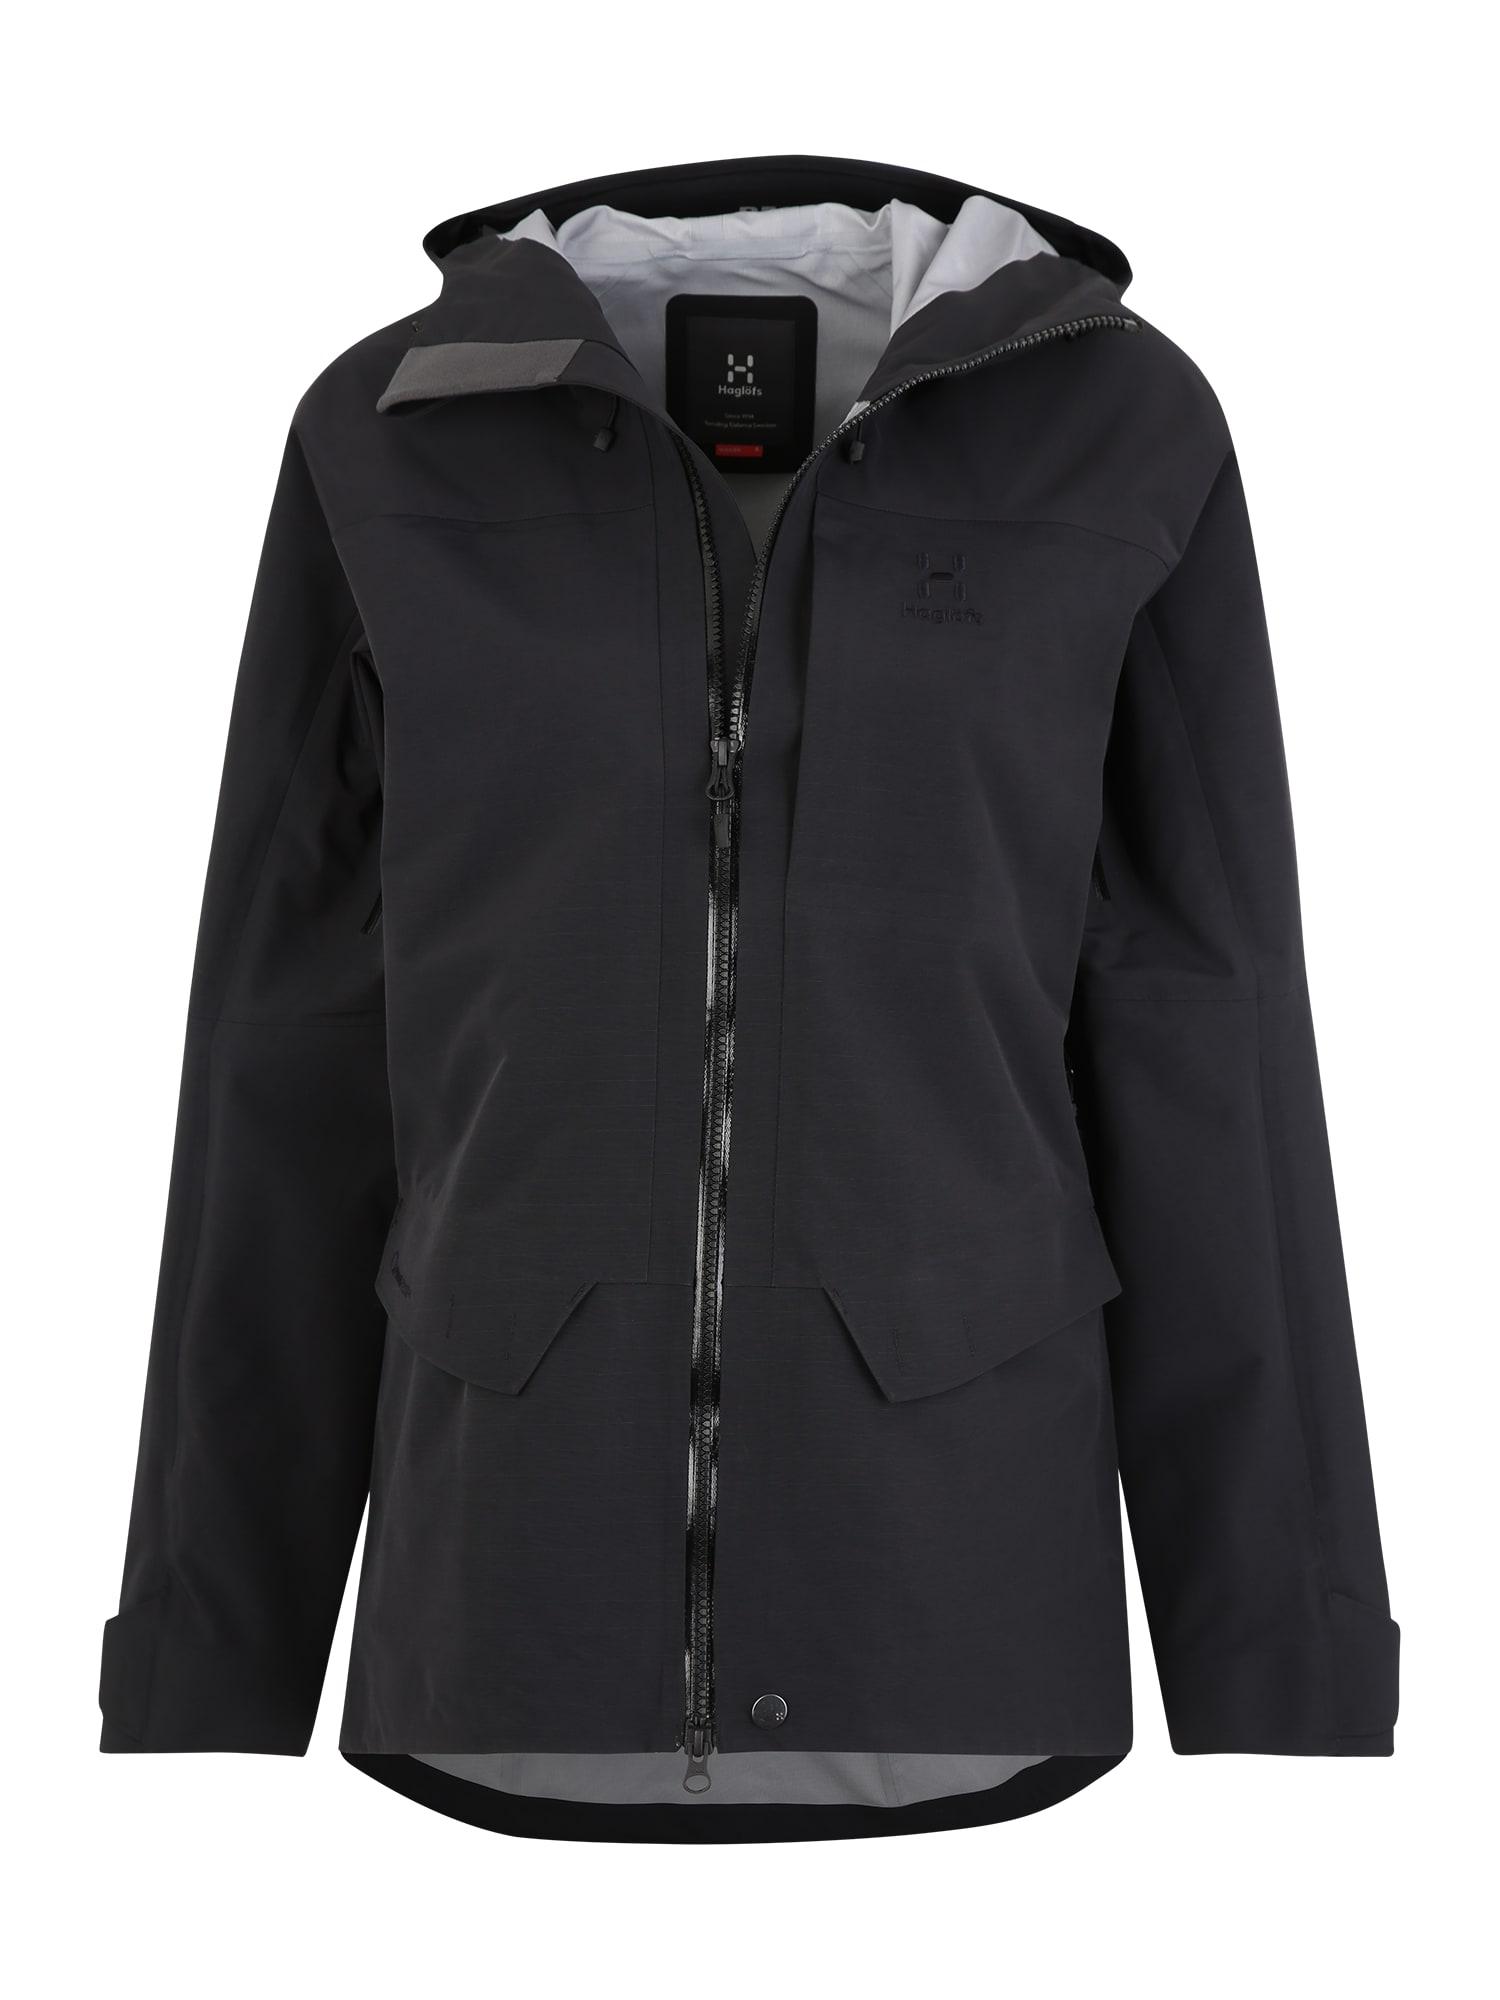 Outdoorová bunda Grym Evo Jacket Women černá Haglöfs